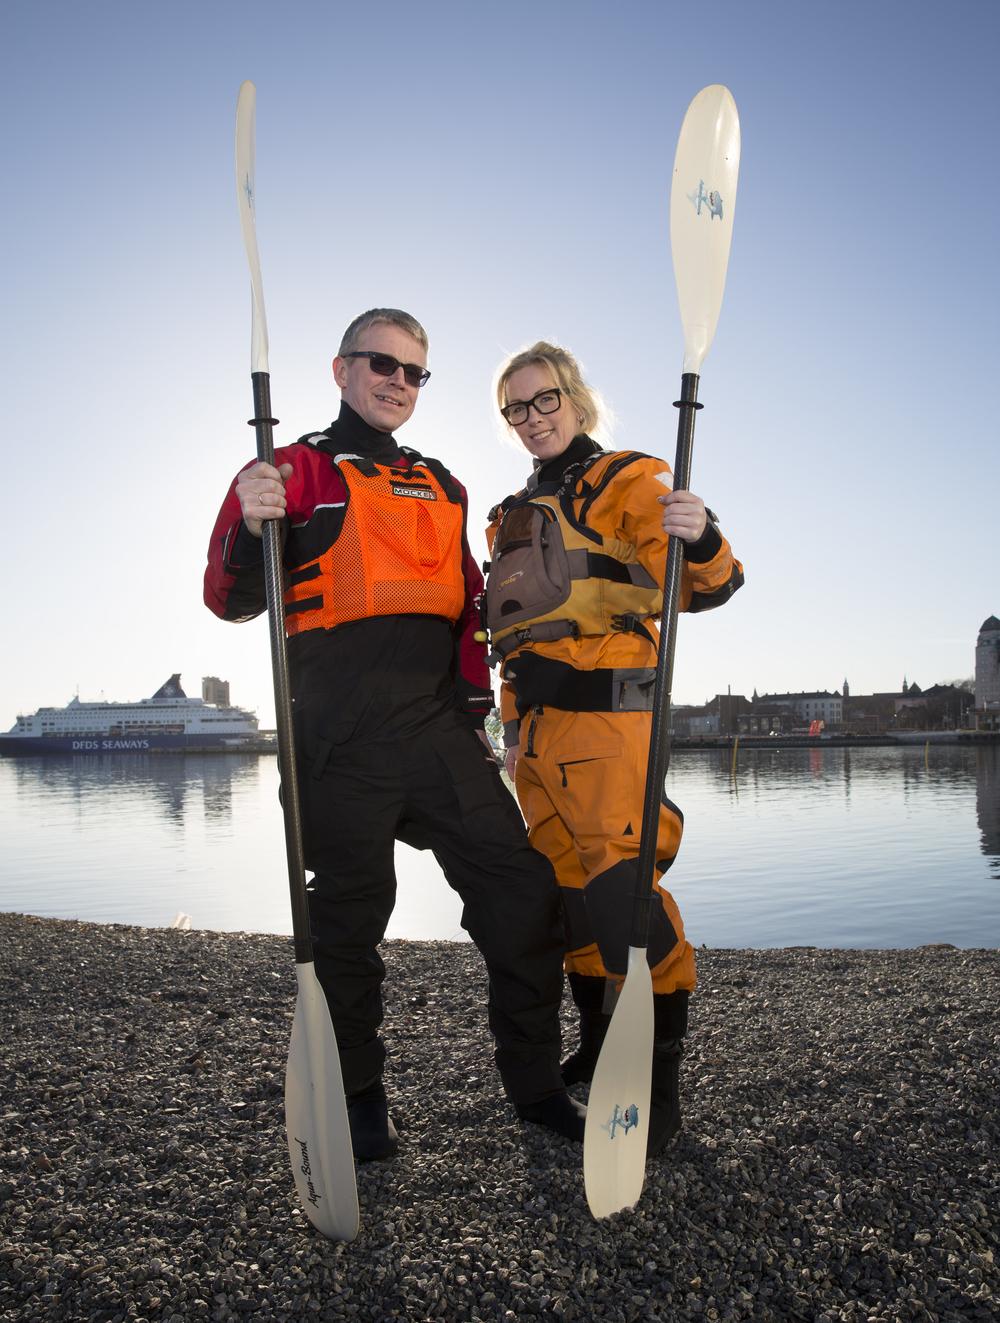 All photos: TomHansen/Innovasjon Norge